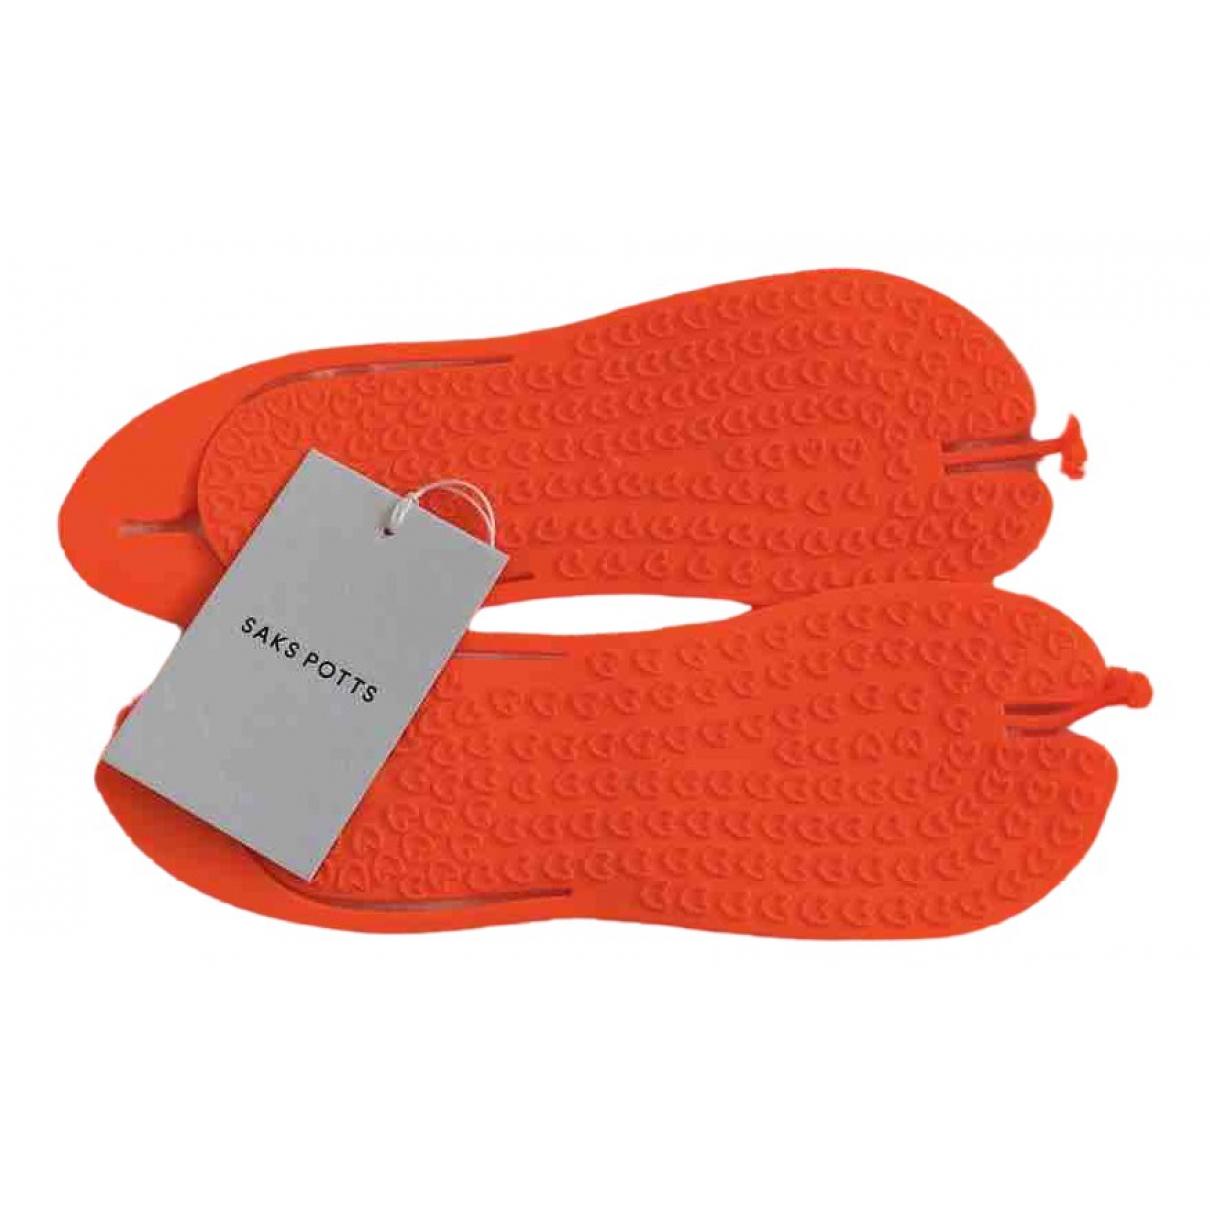 Saks Potts \N Orange Sandals for Women 38 EU